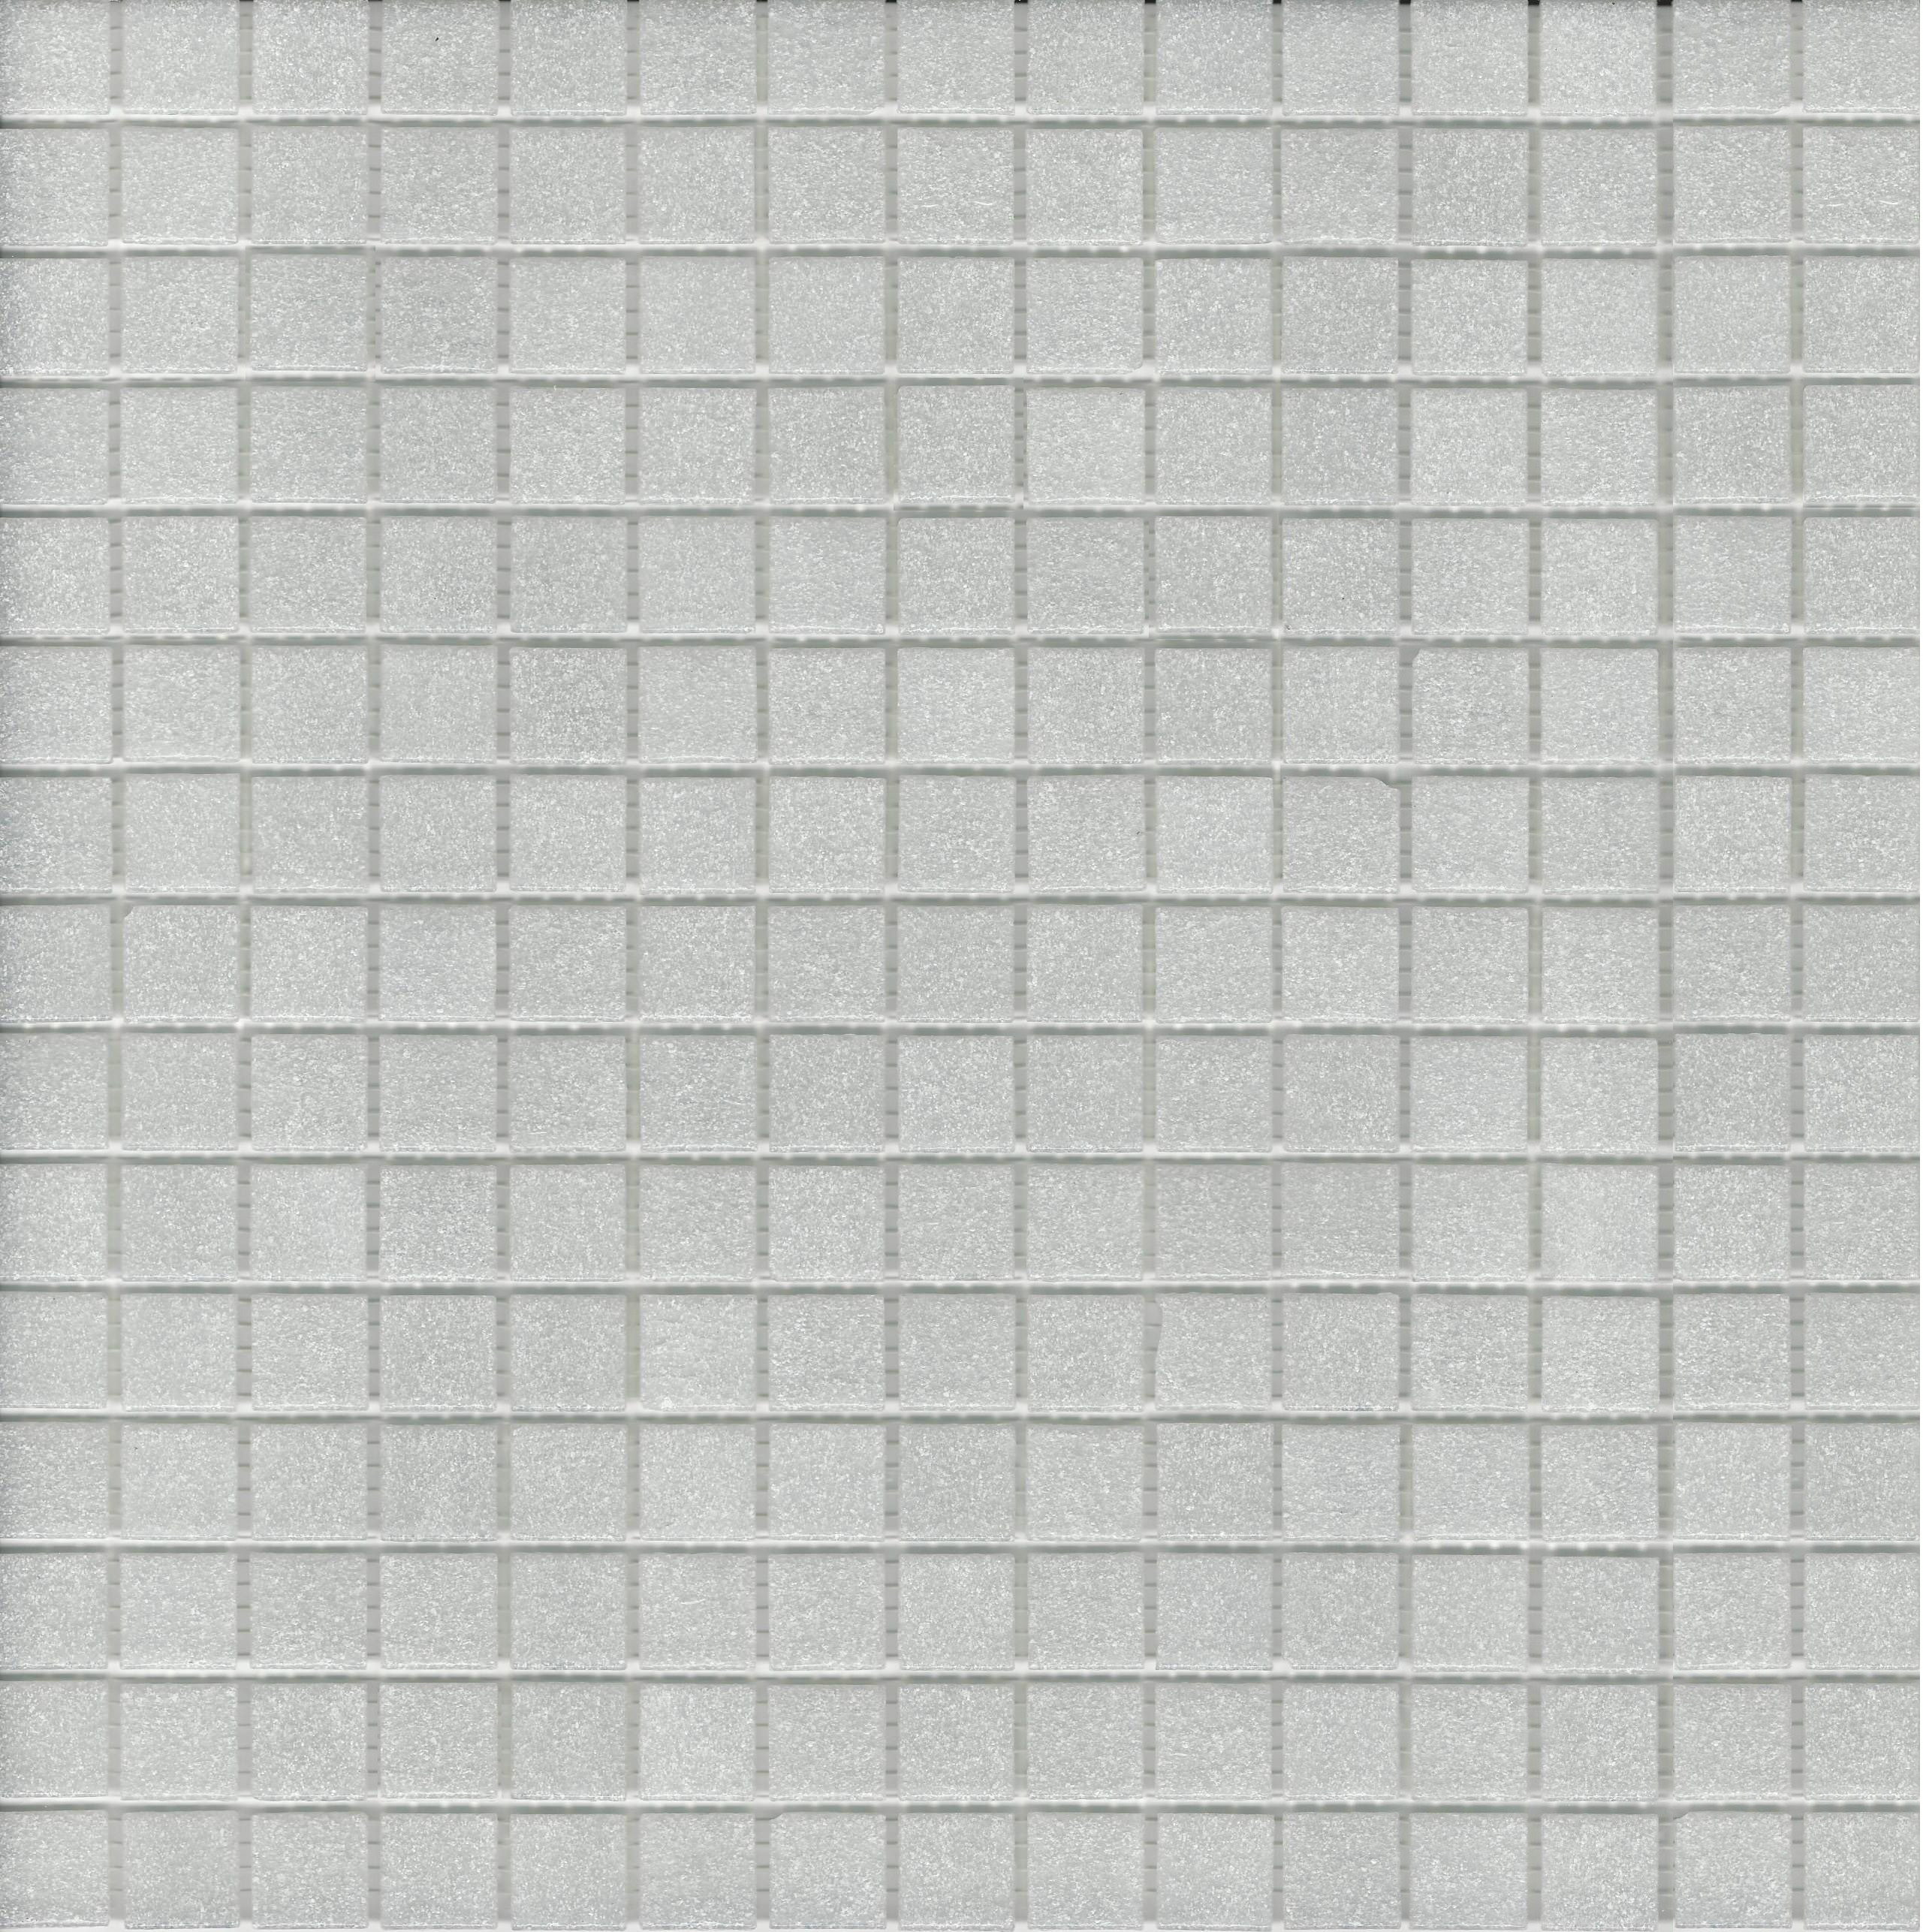 Badkamertegels Lichtgrijs : Mozaiek glas a lichtgrijs bij max home